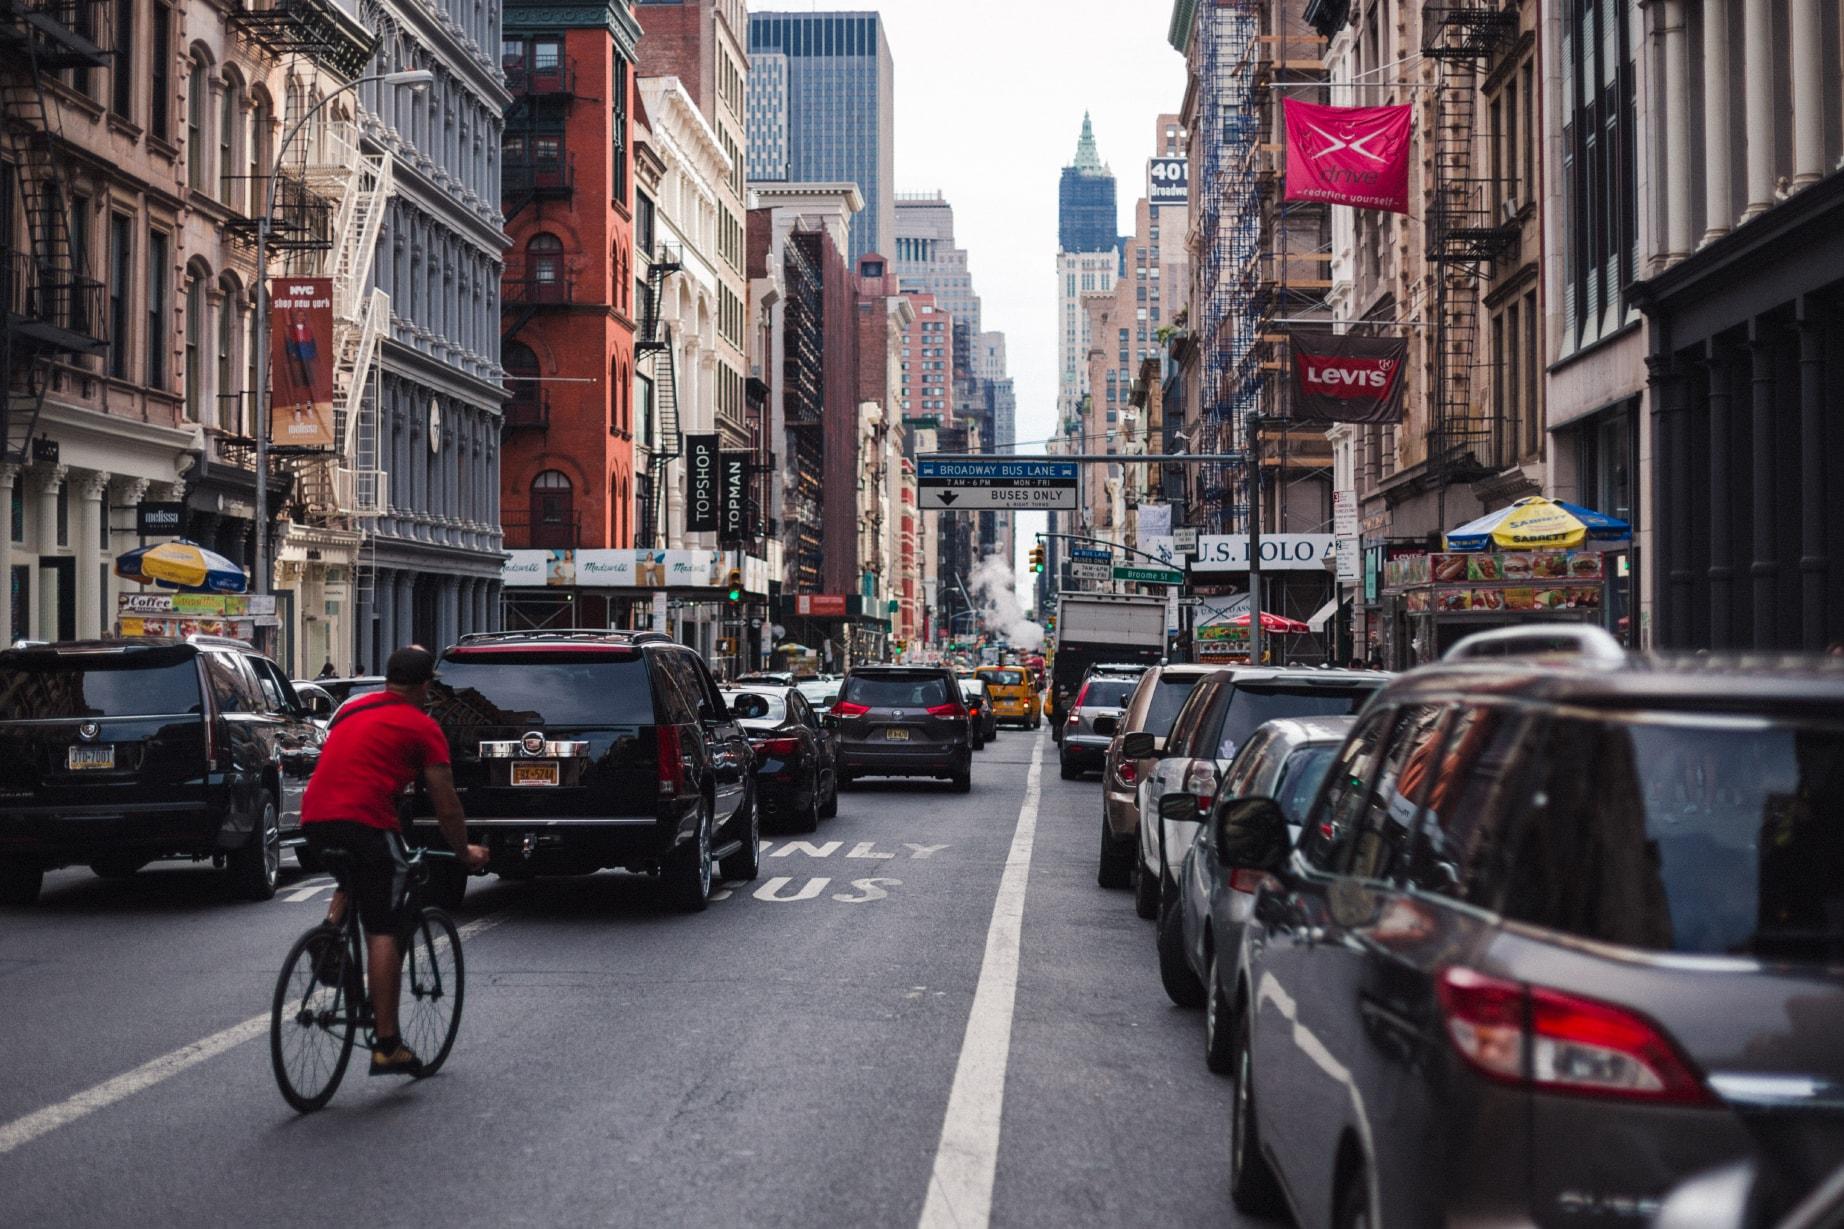 New York City - Broadway